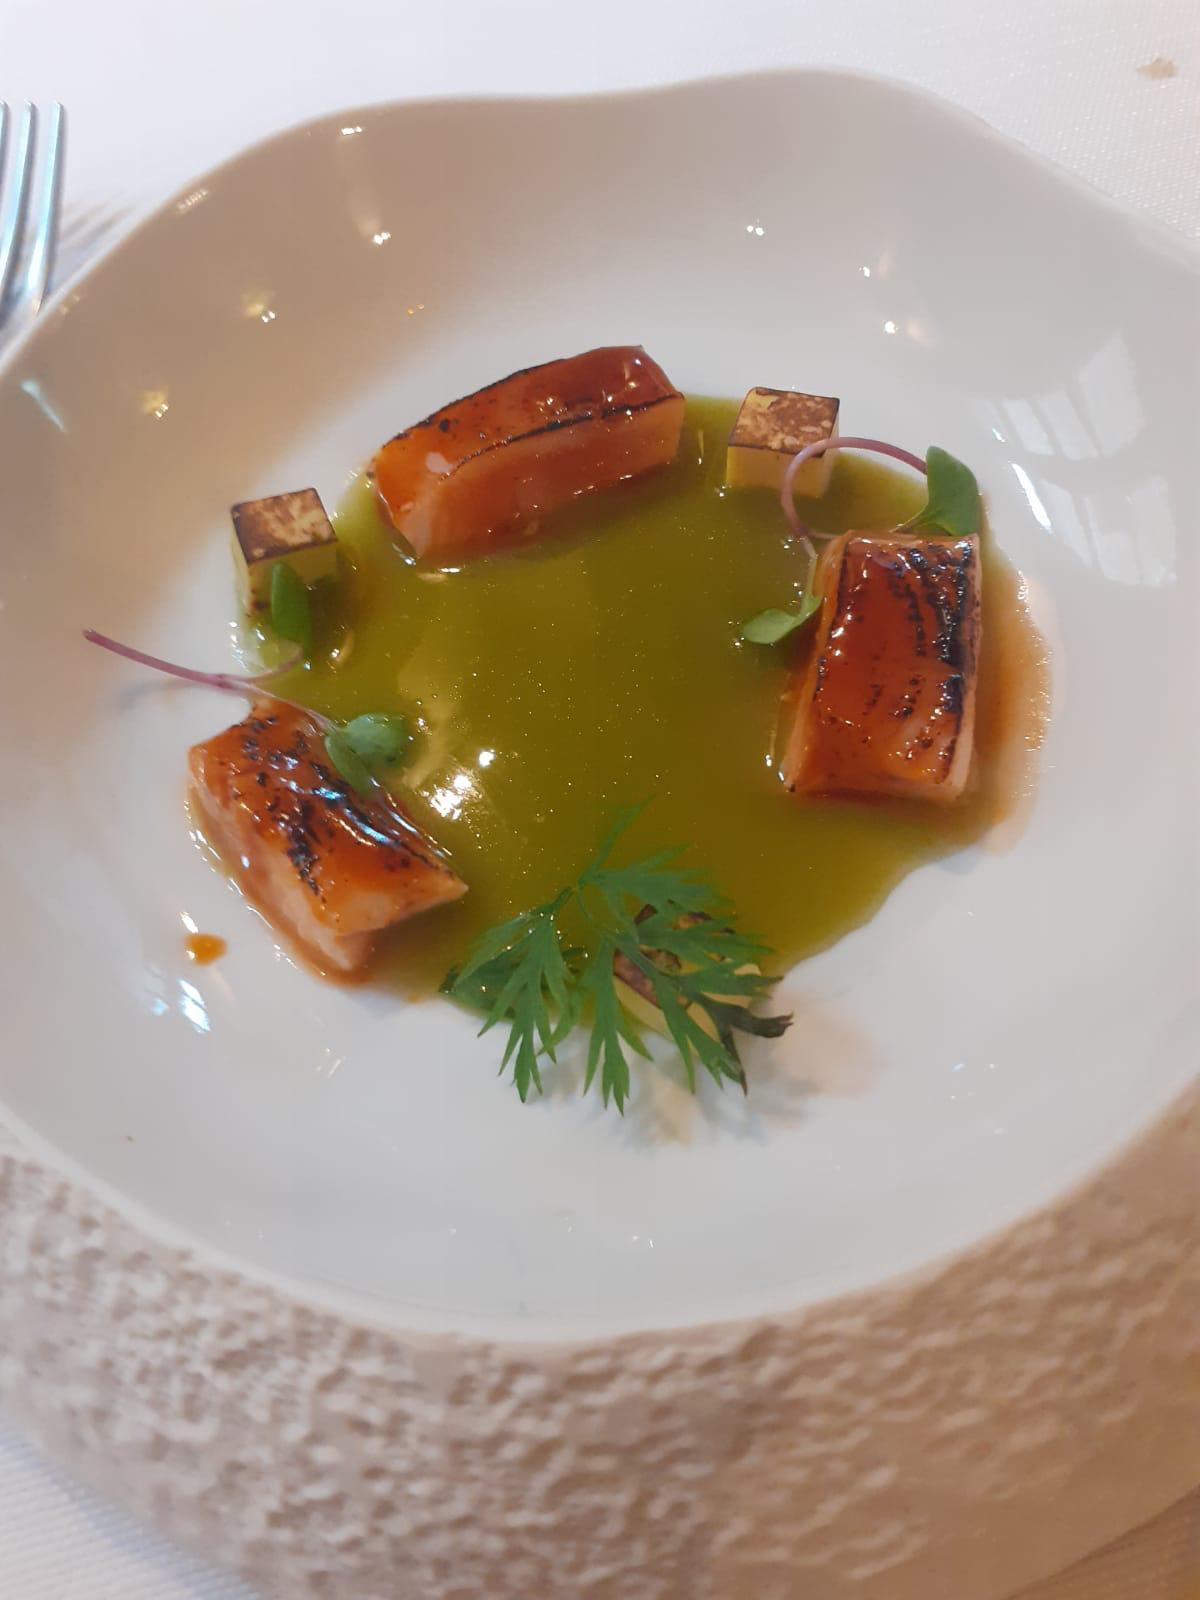 Reseña Gastronómica: Restaurante MU-Na de Ponferrada 11